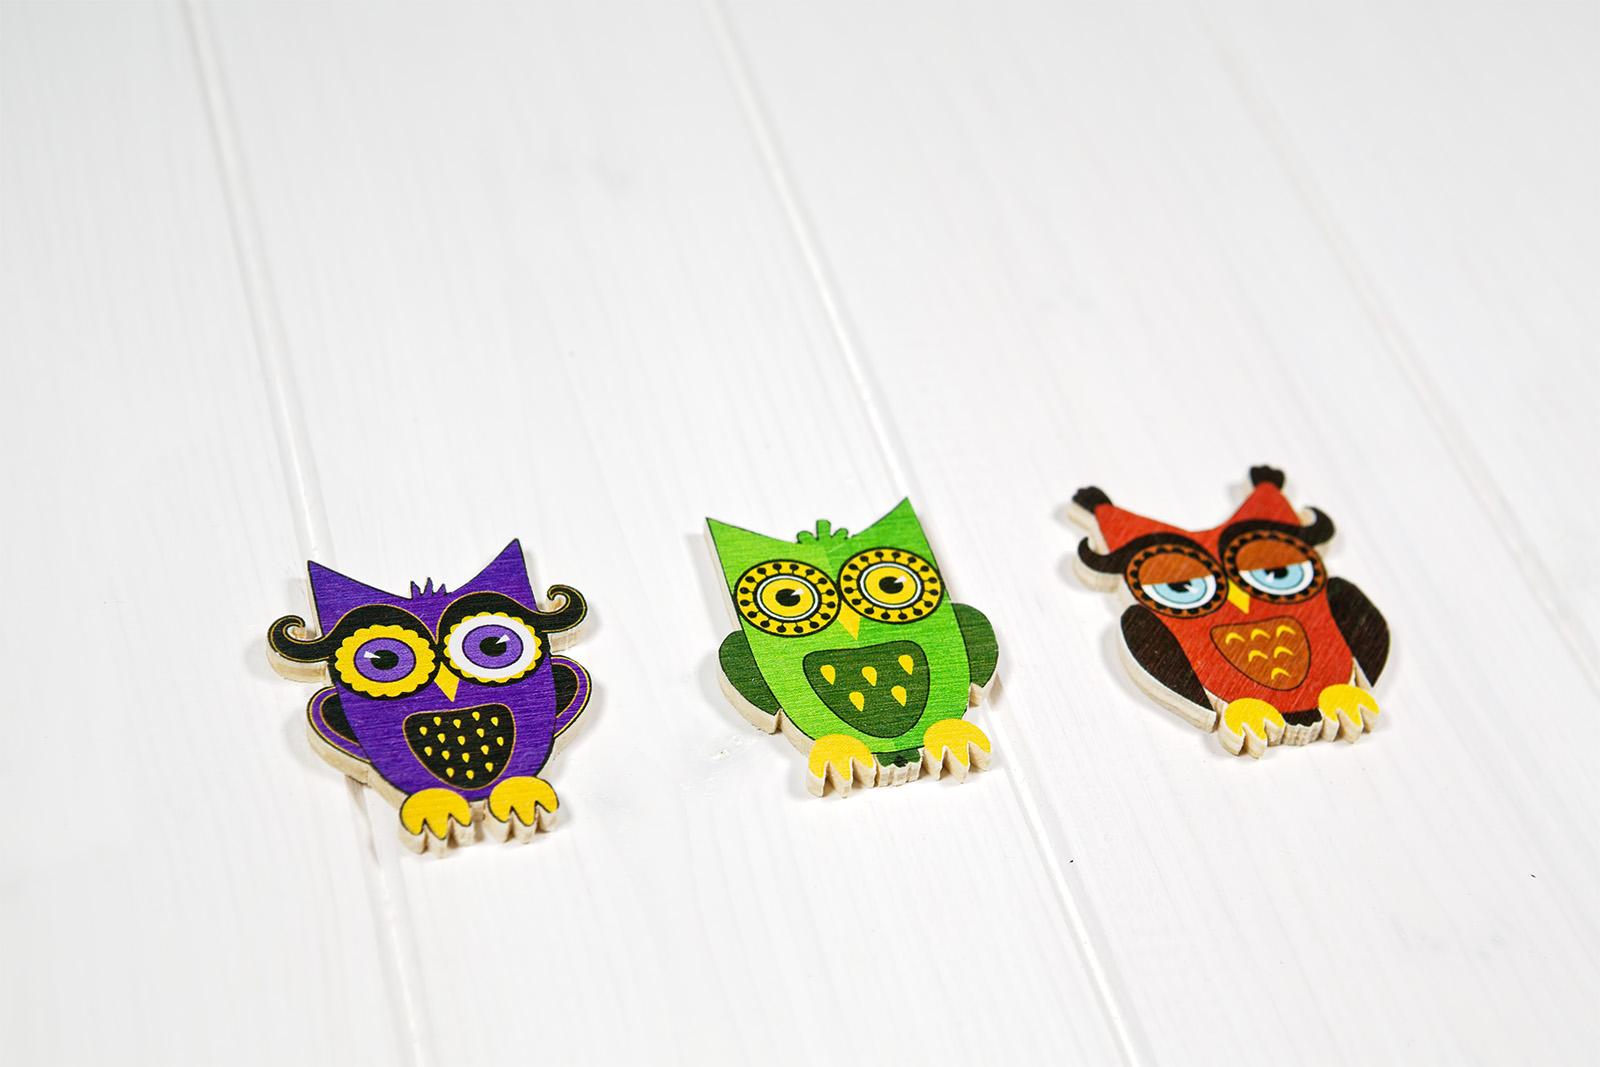 Calamite Sagomate A Forma Di Gufo - Owl Magnet